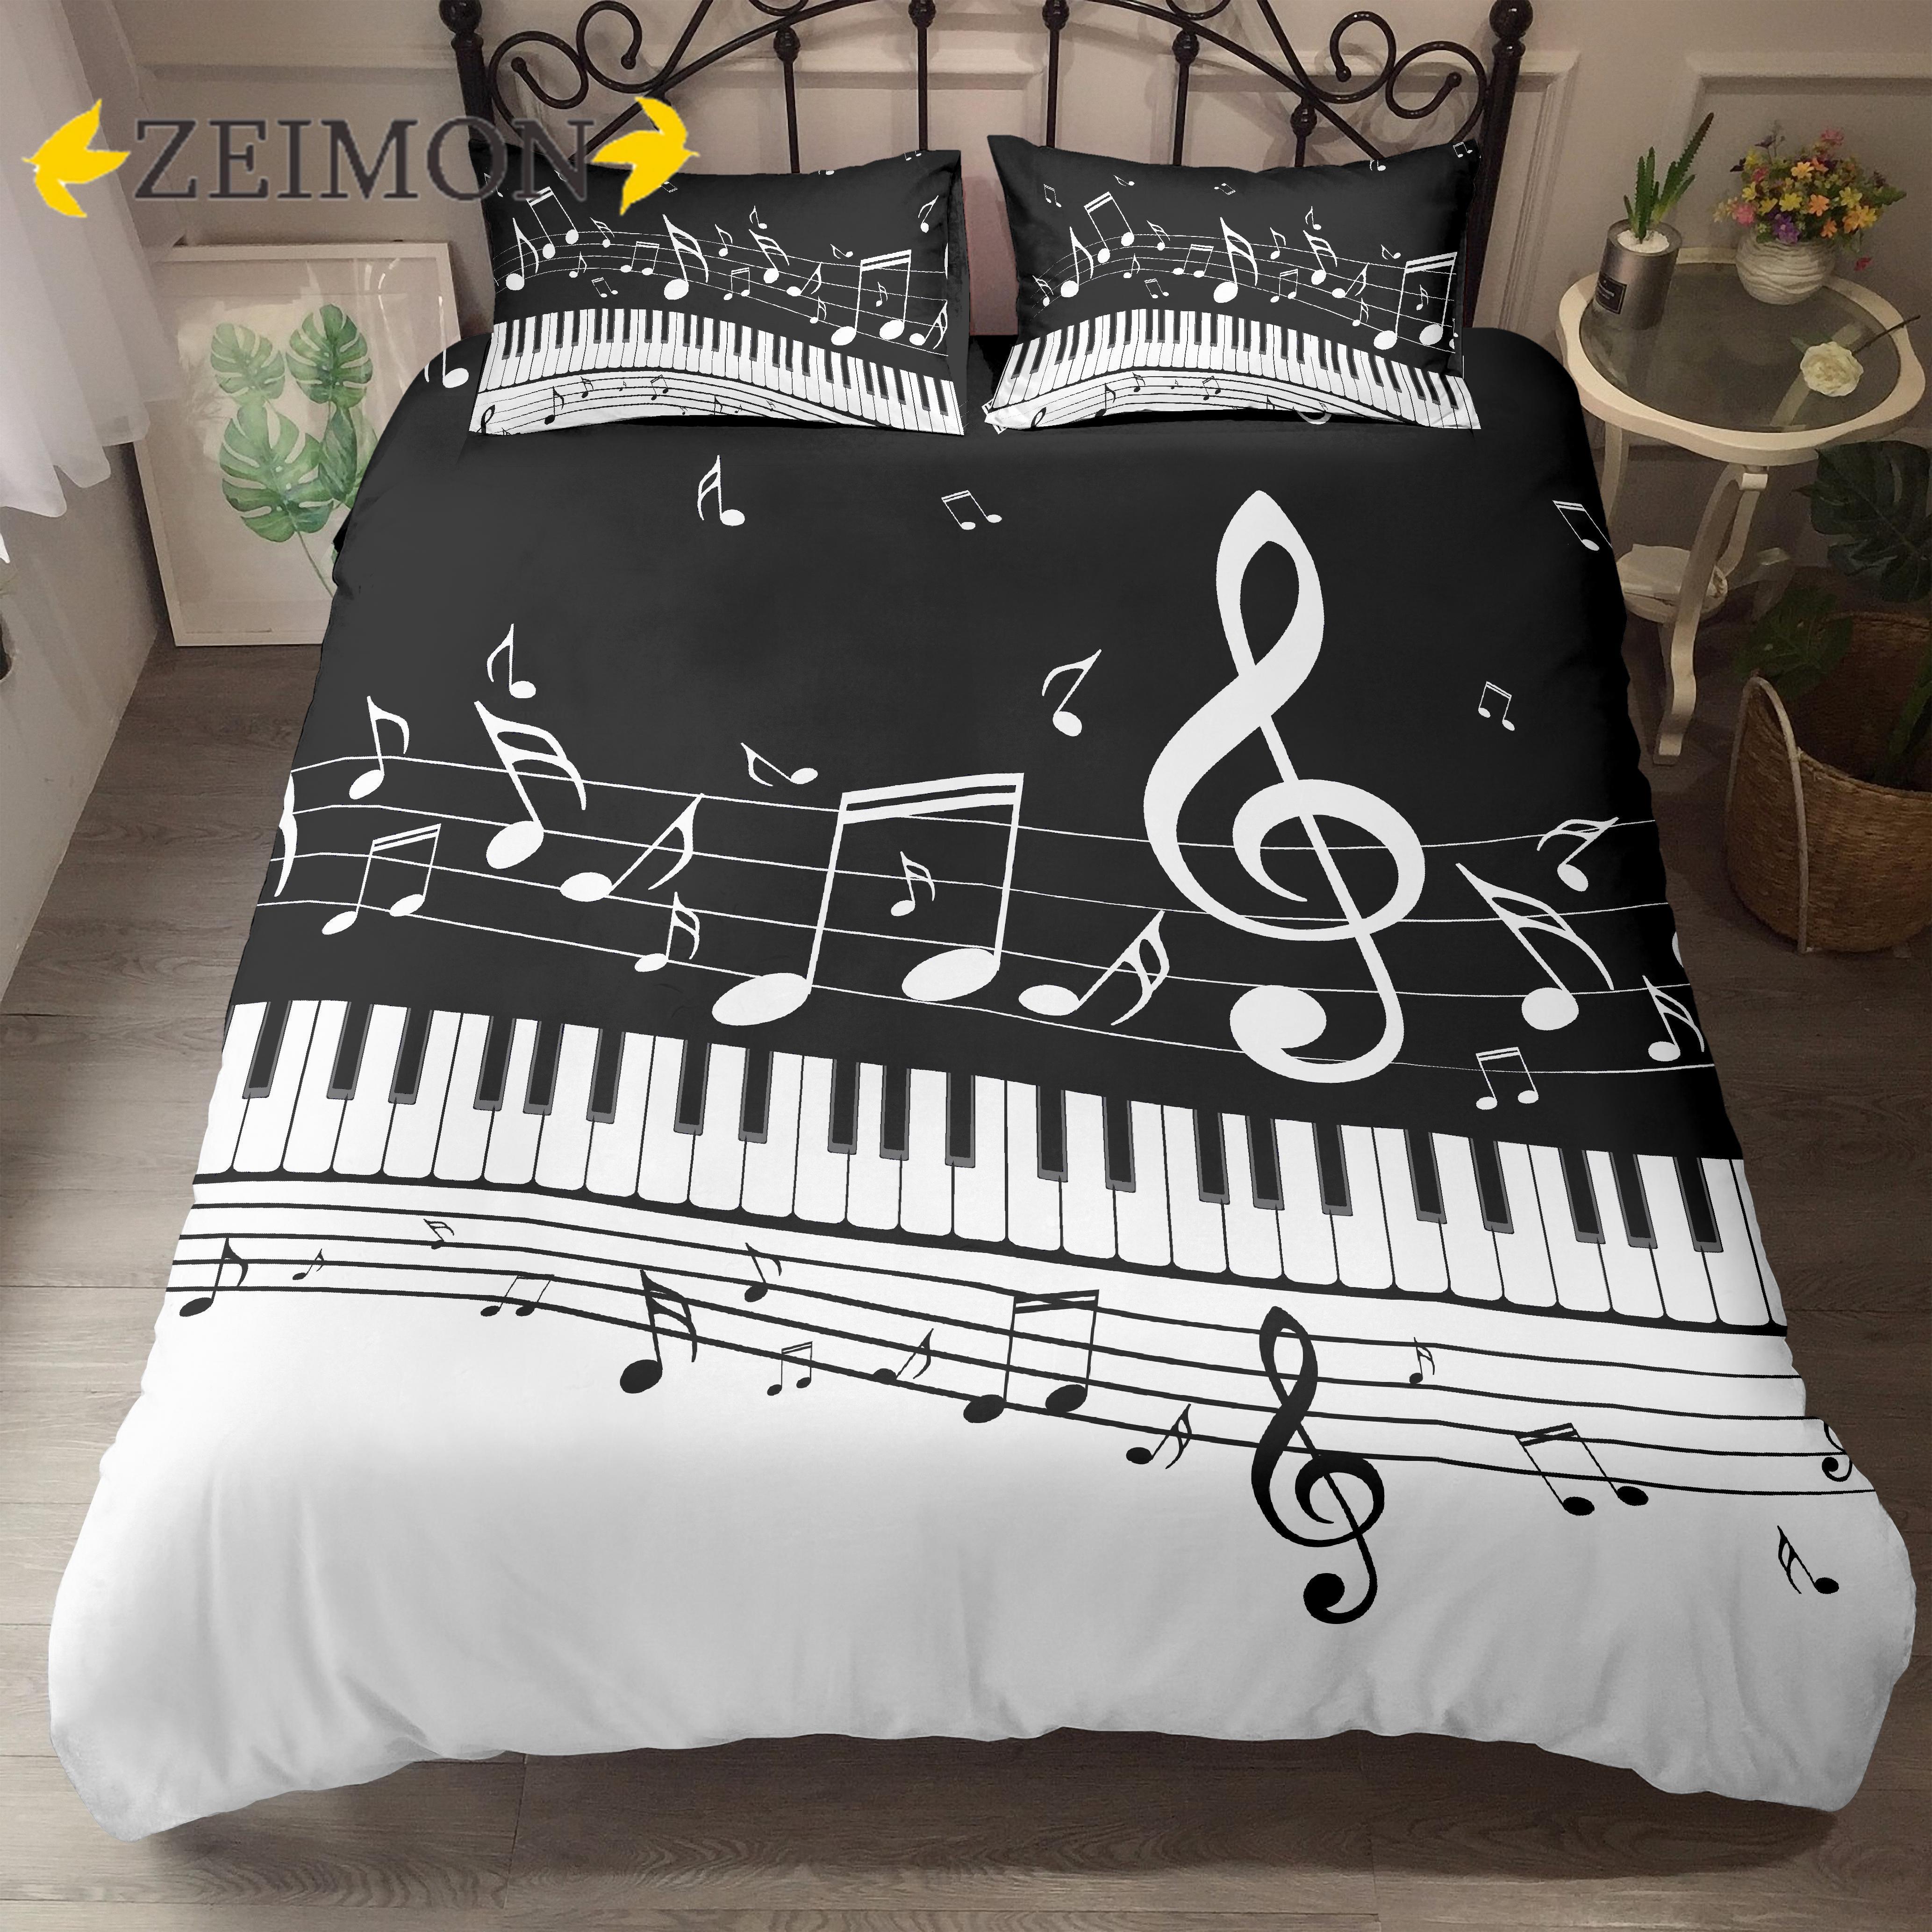 ZEIMON ثلاثية الأبعاد طقم ملائات سرير مطبوع الموسيقى ملاحظة ثلاثة أضعاف الموظفين أبيض وأسود 2/3 قطع حاف طقم أغطية السرير البوليستر الملابس